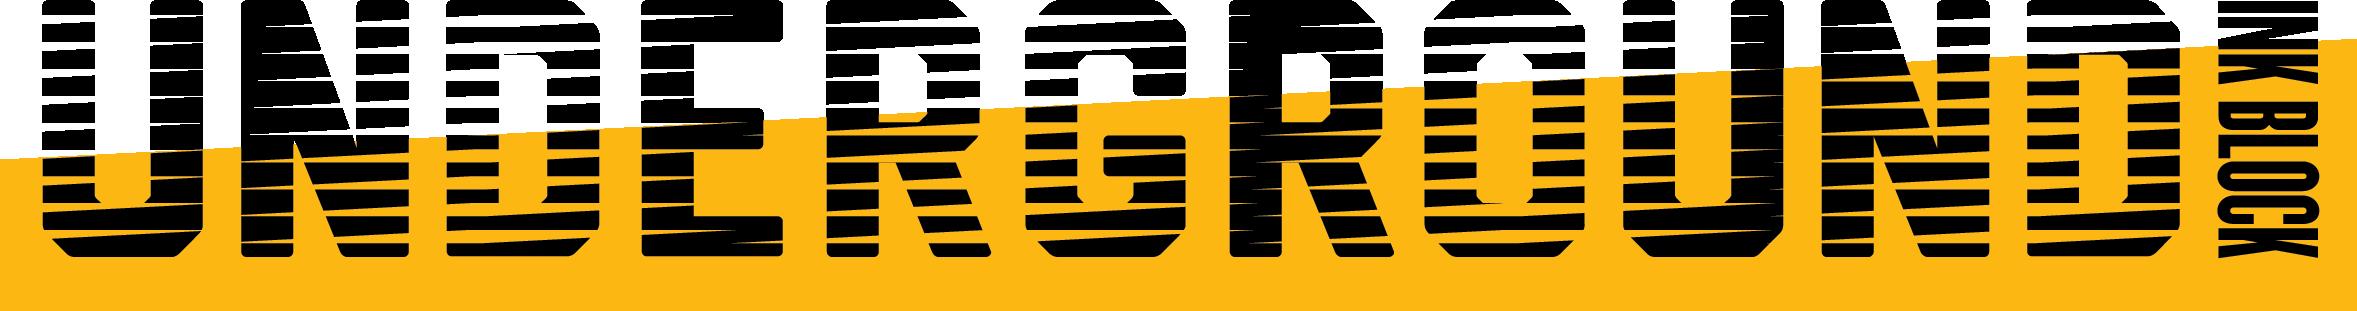 UNDERGROUND_logo_lockup_cmyk.png